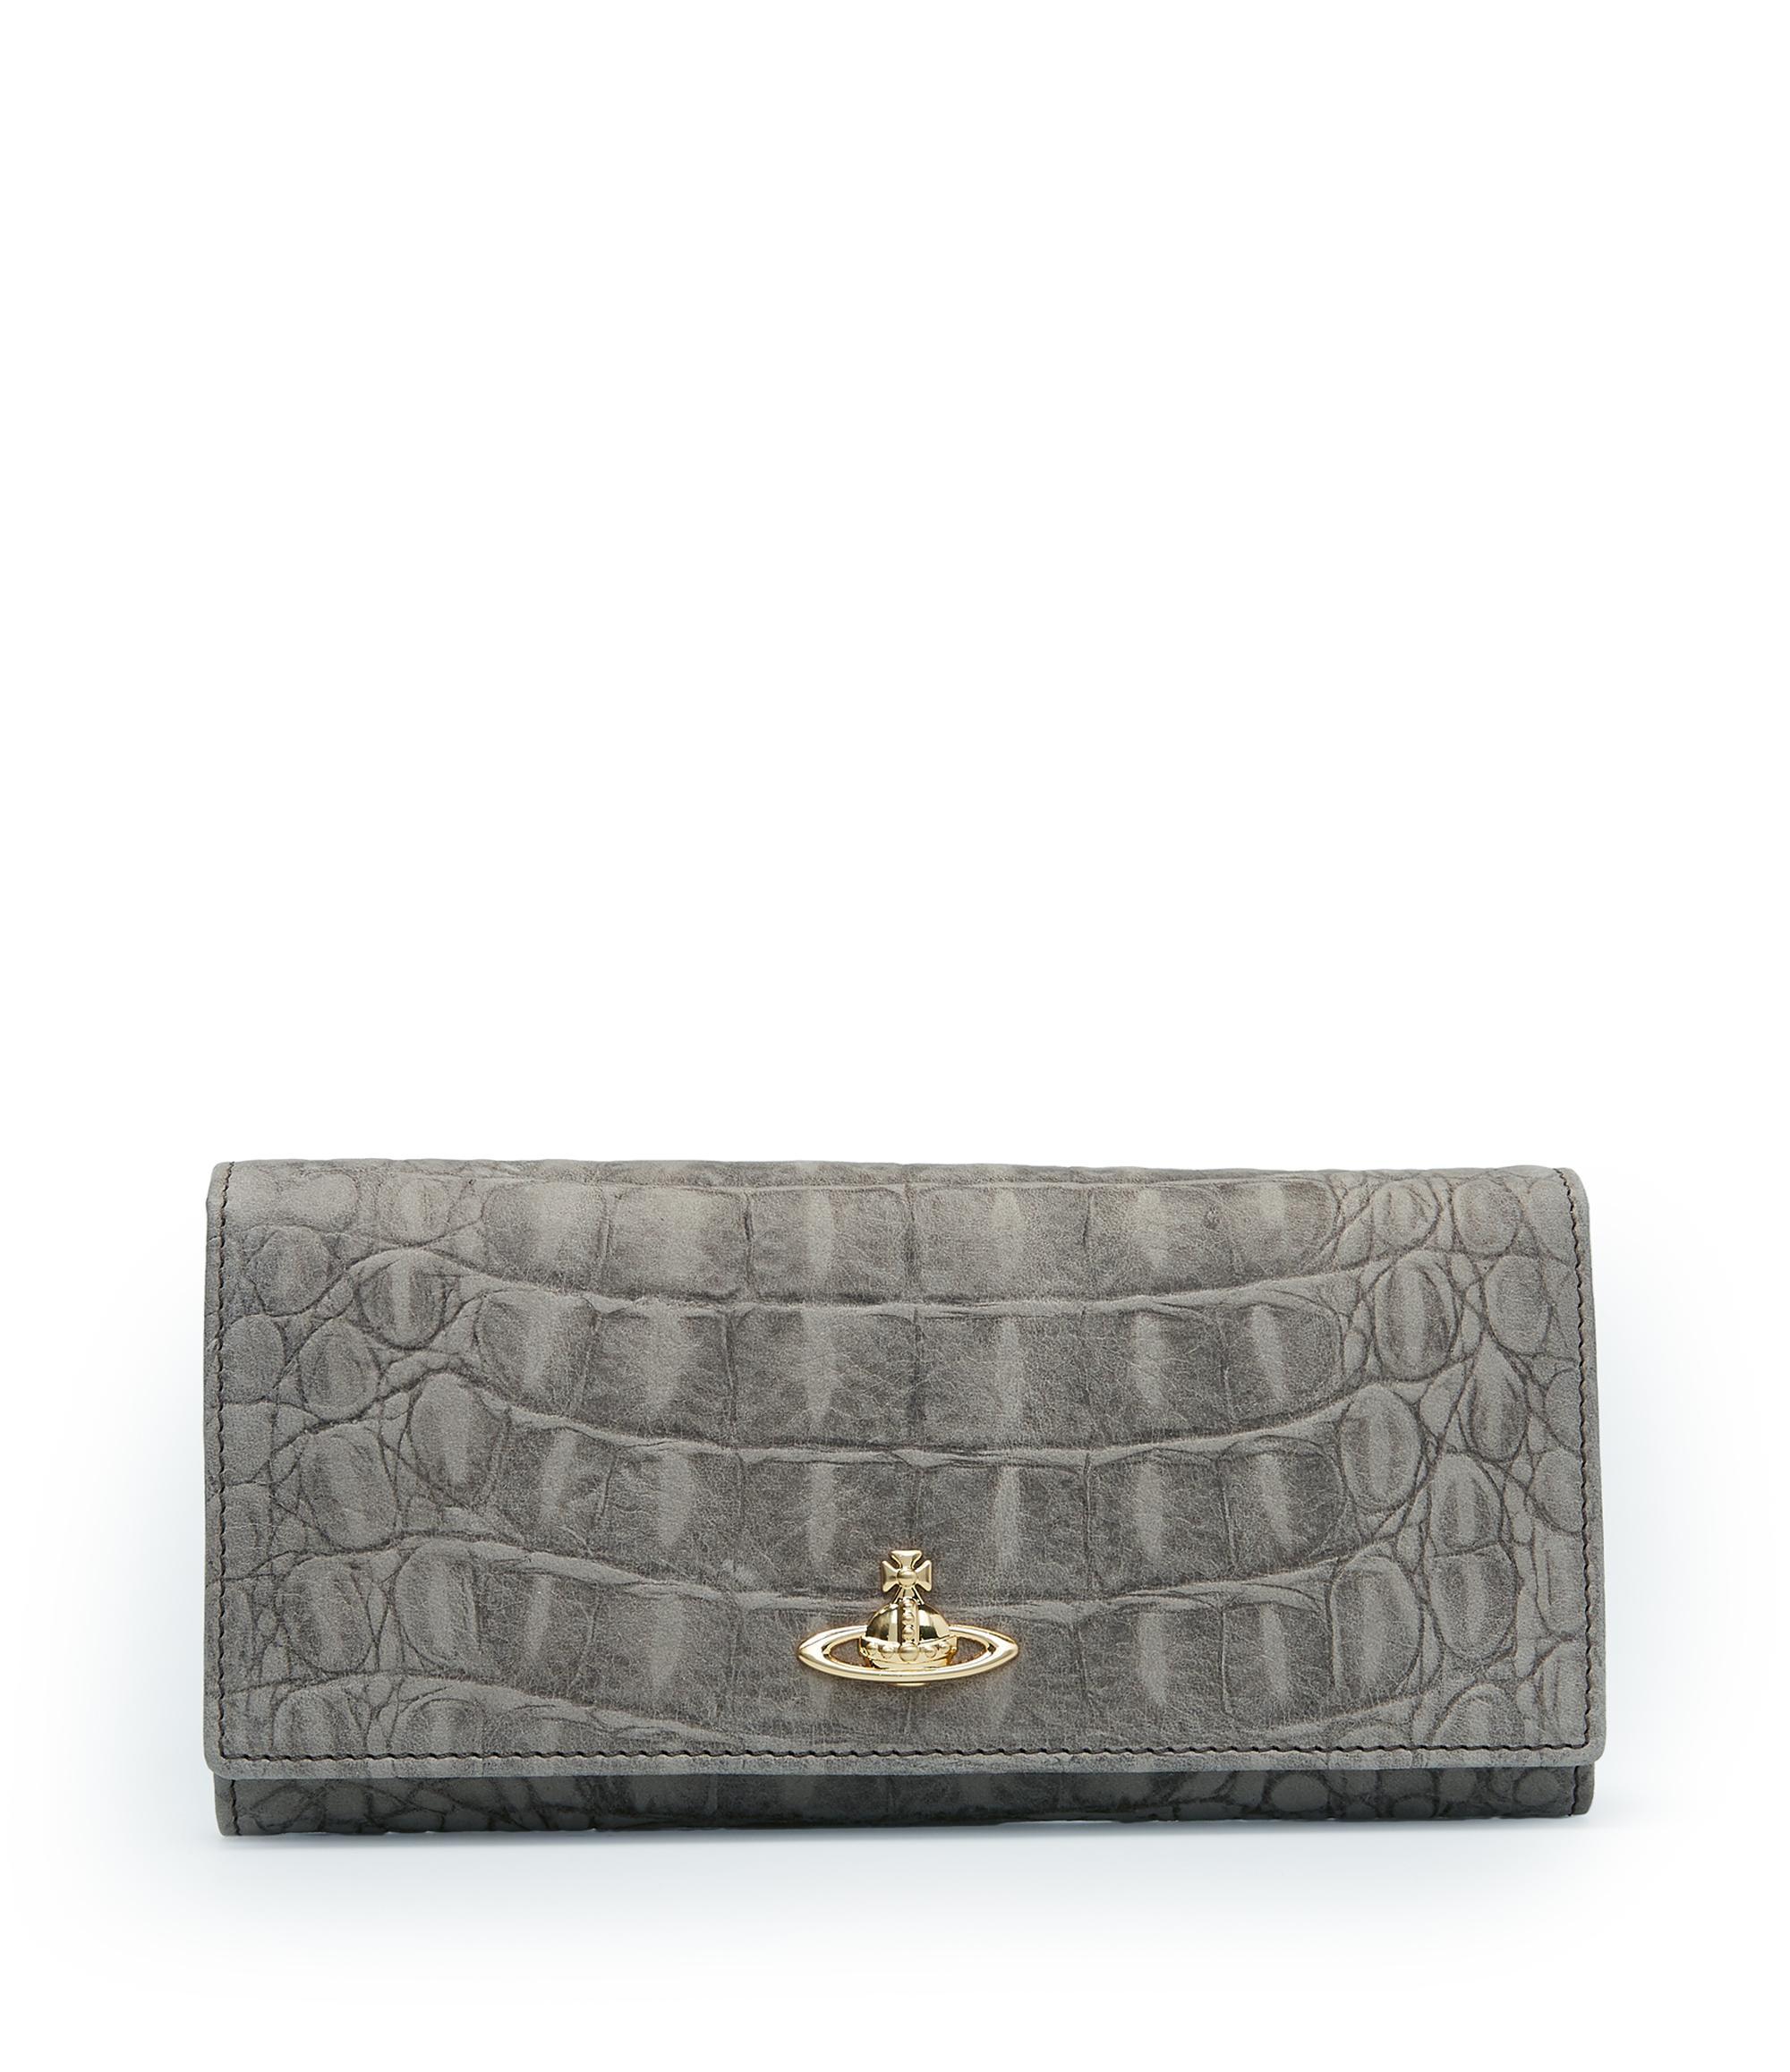 49edfe10333 Vivienne Westwood Grey Amazonia Wallet 321321   ModeSens